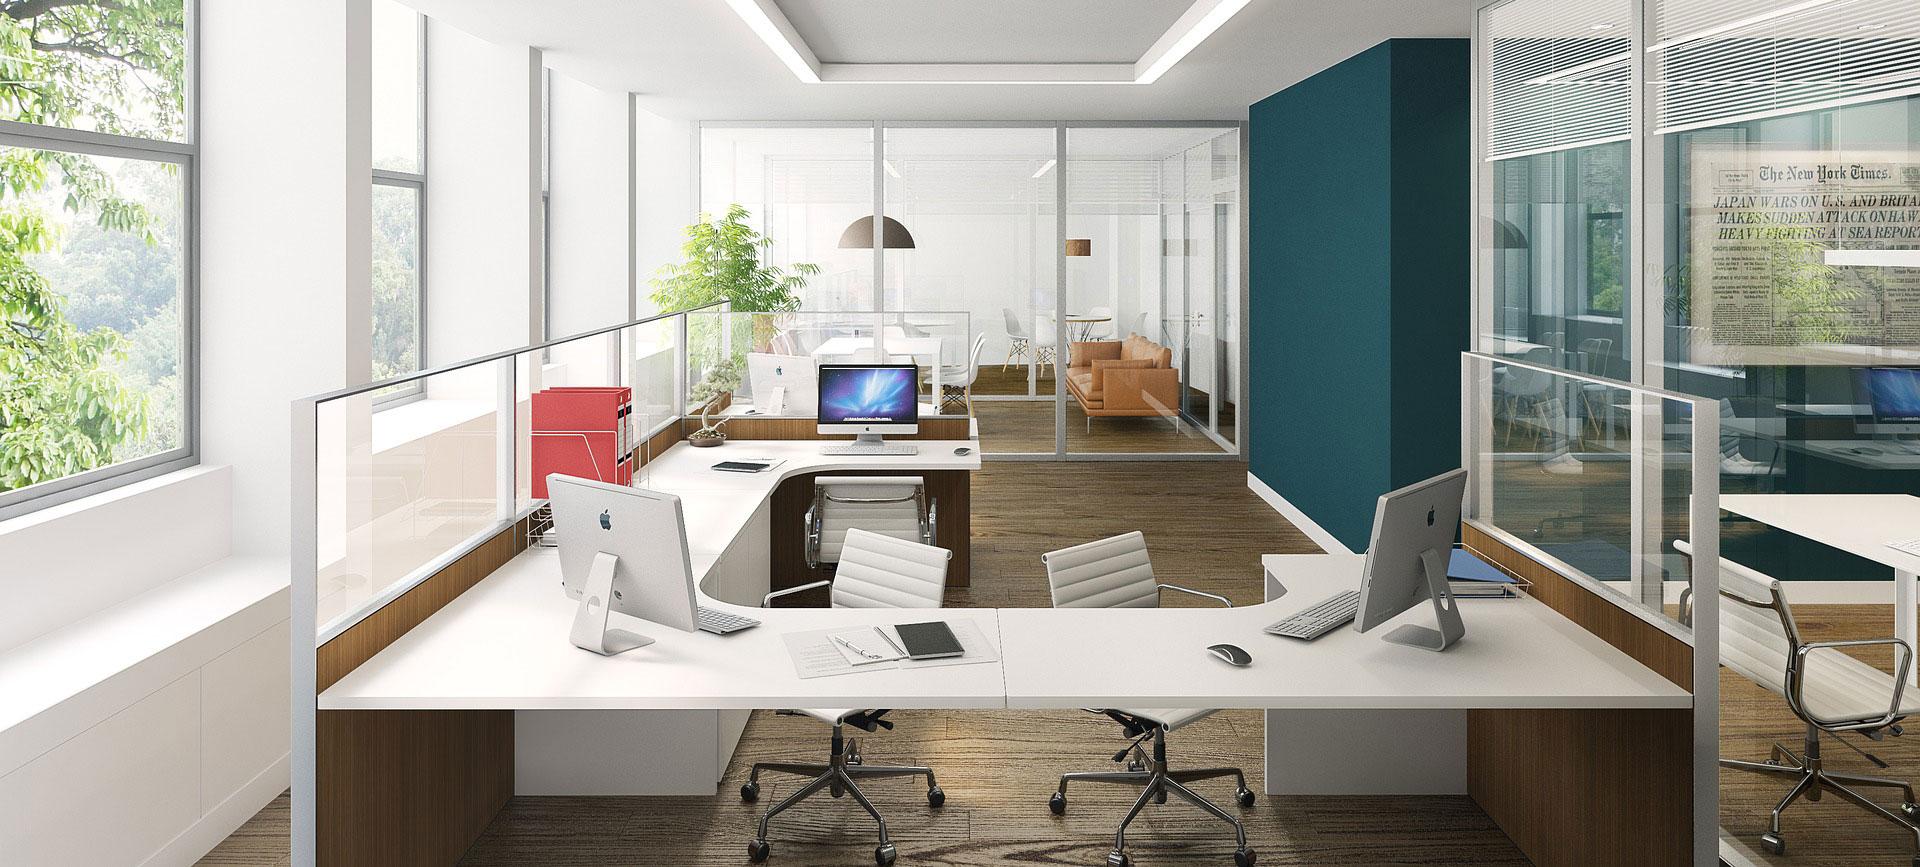 office-1966381 1920